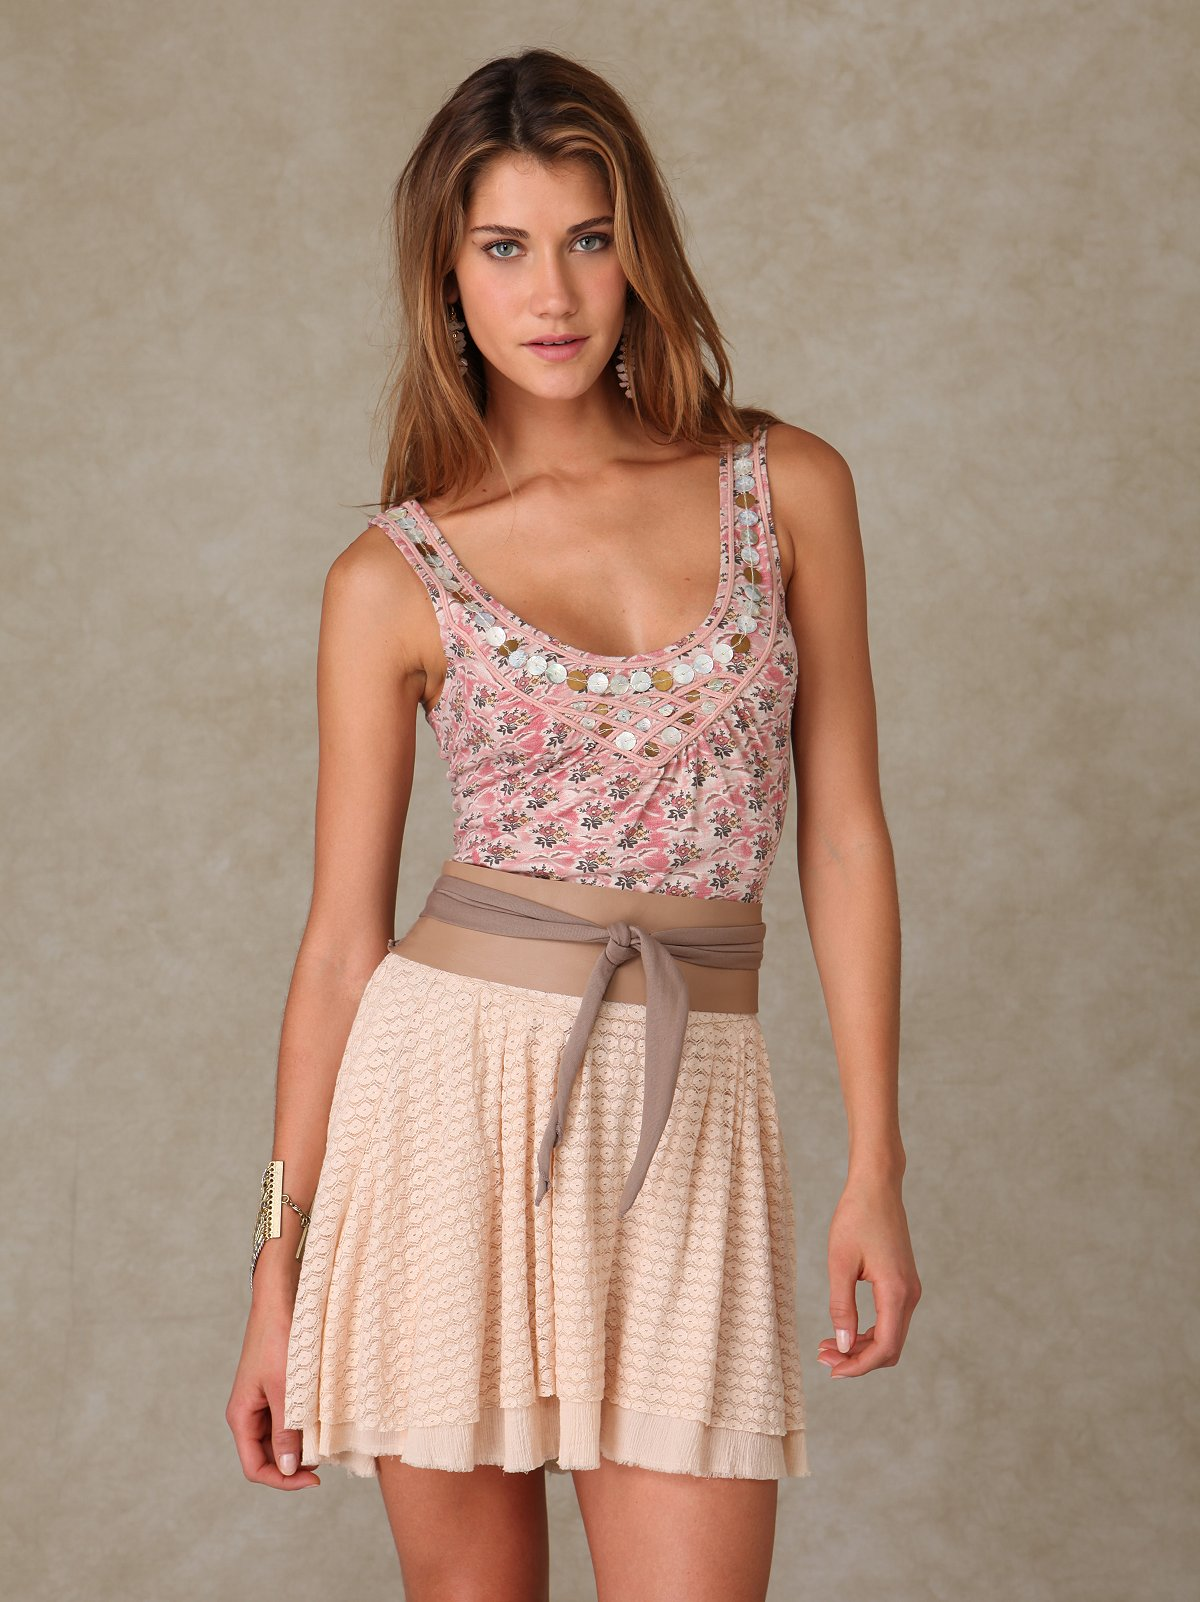 Lacy Lu Skirt